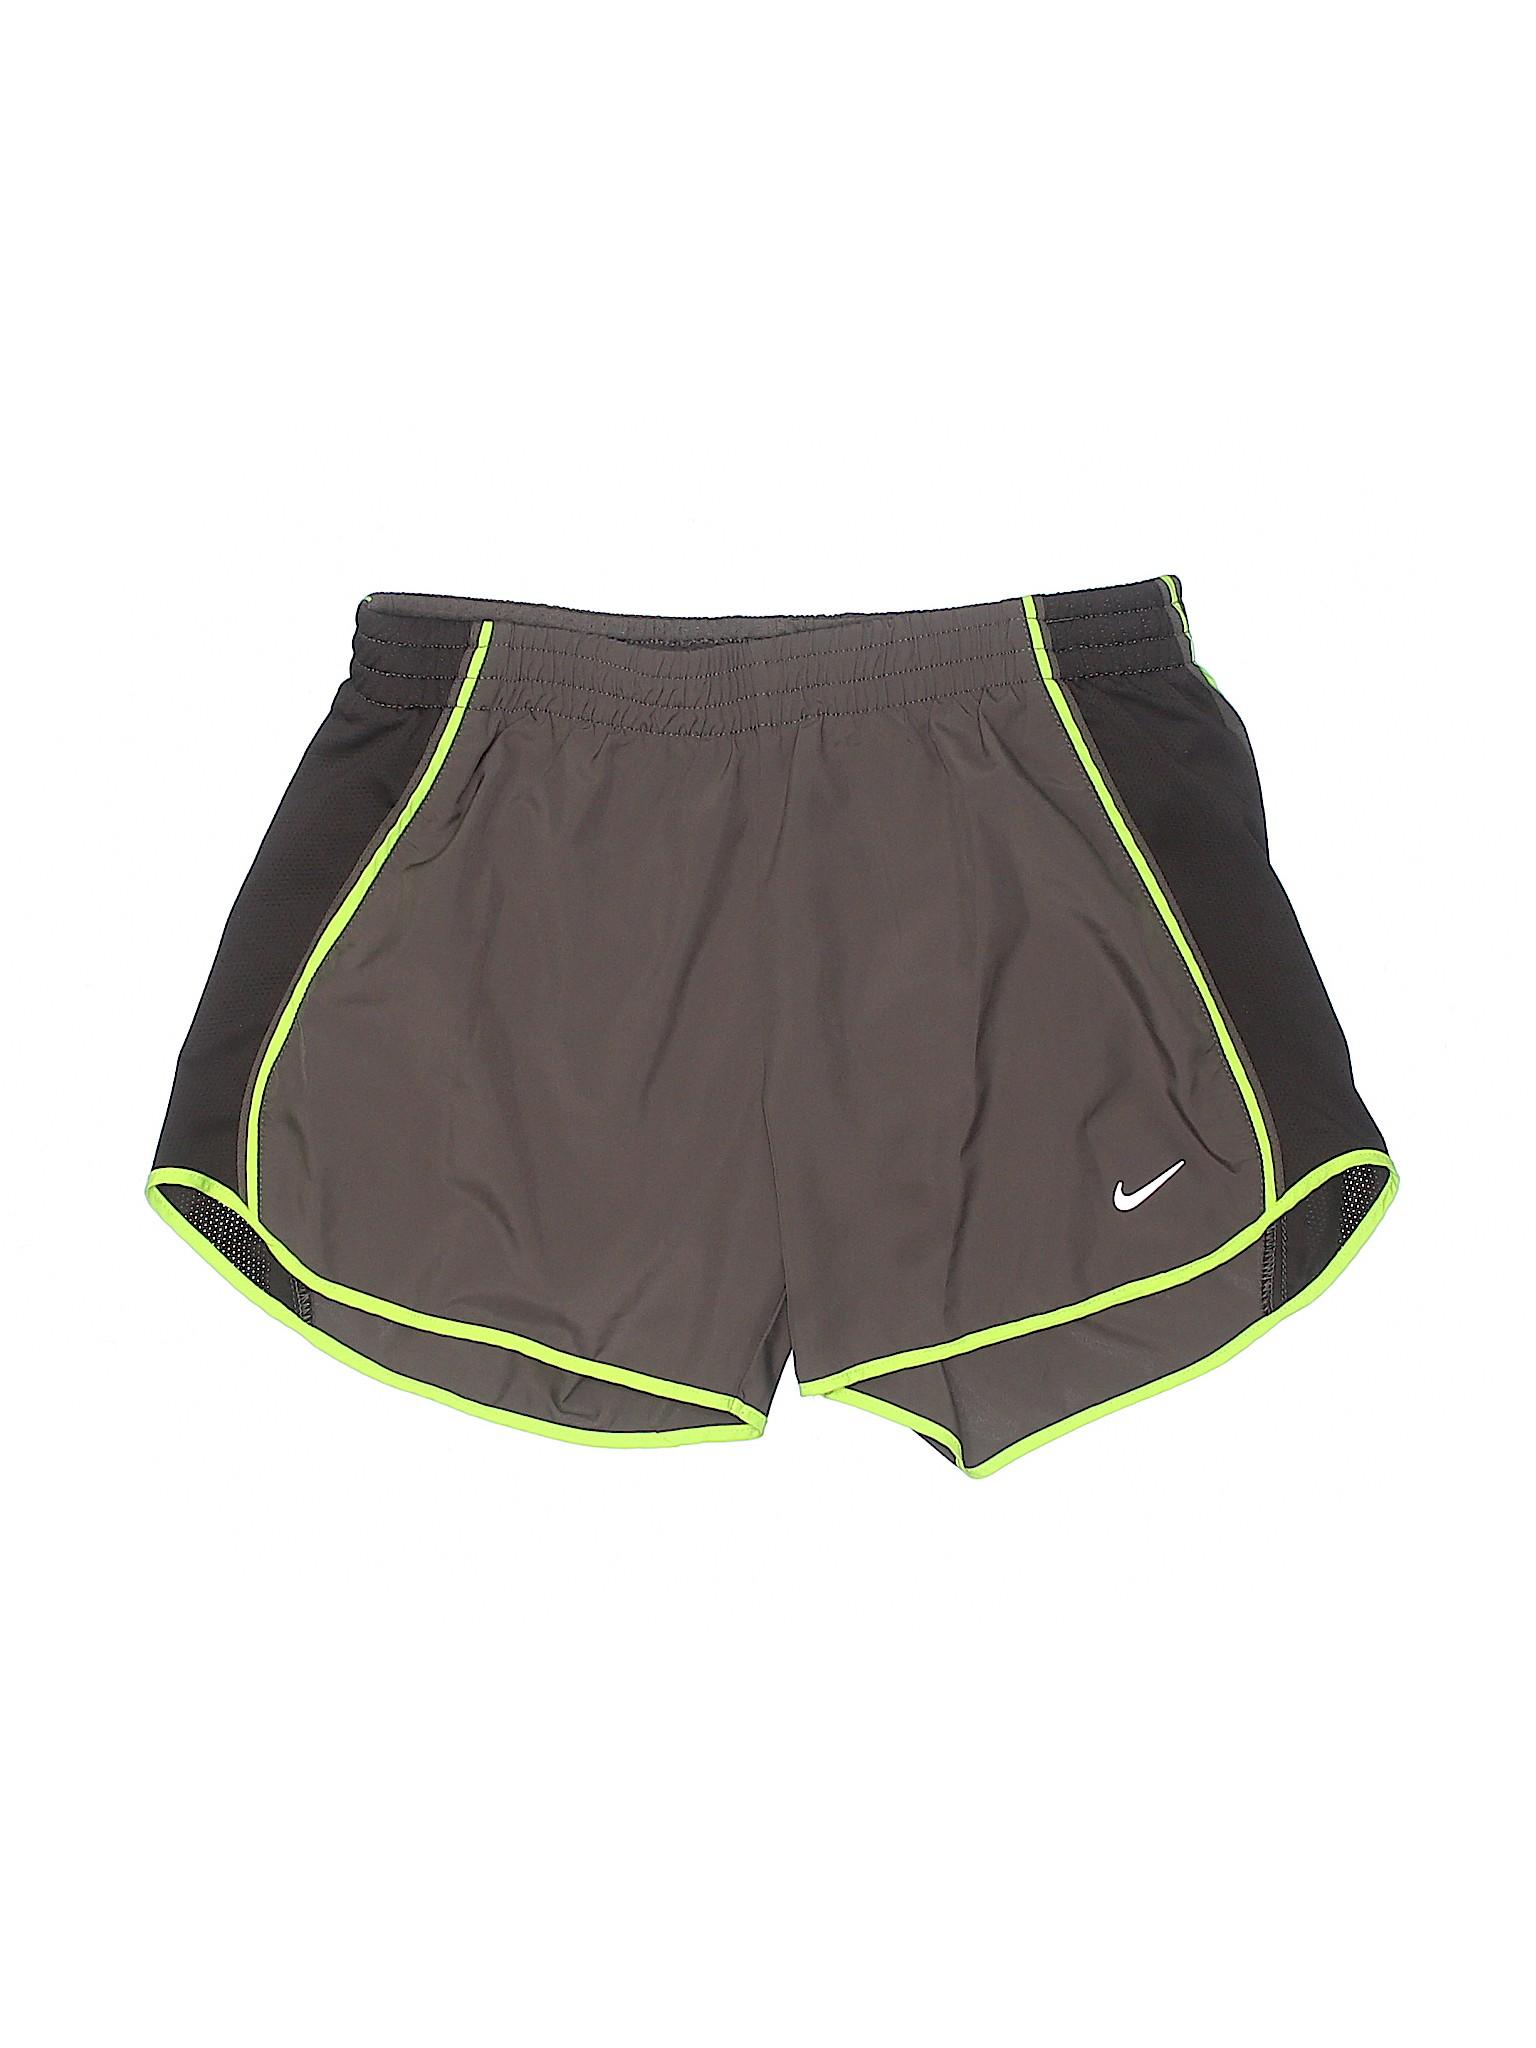 Boutique Athletic Nike Nike Shorts Boutique 4qr74na